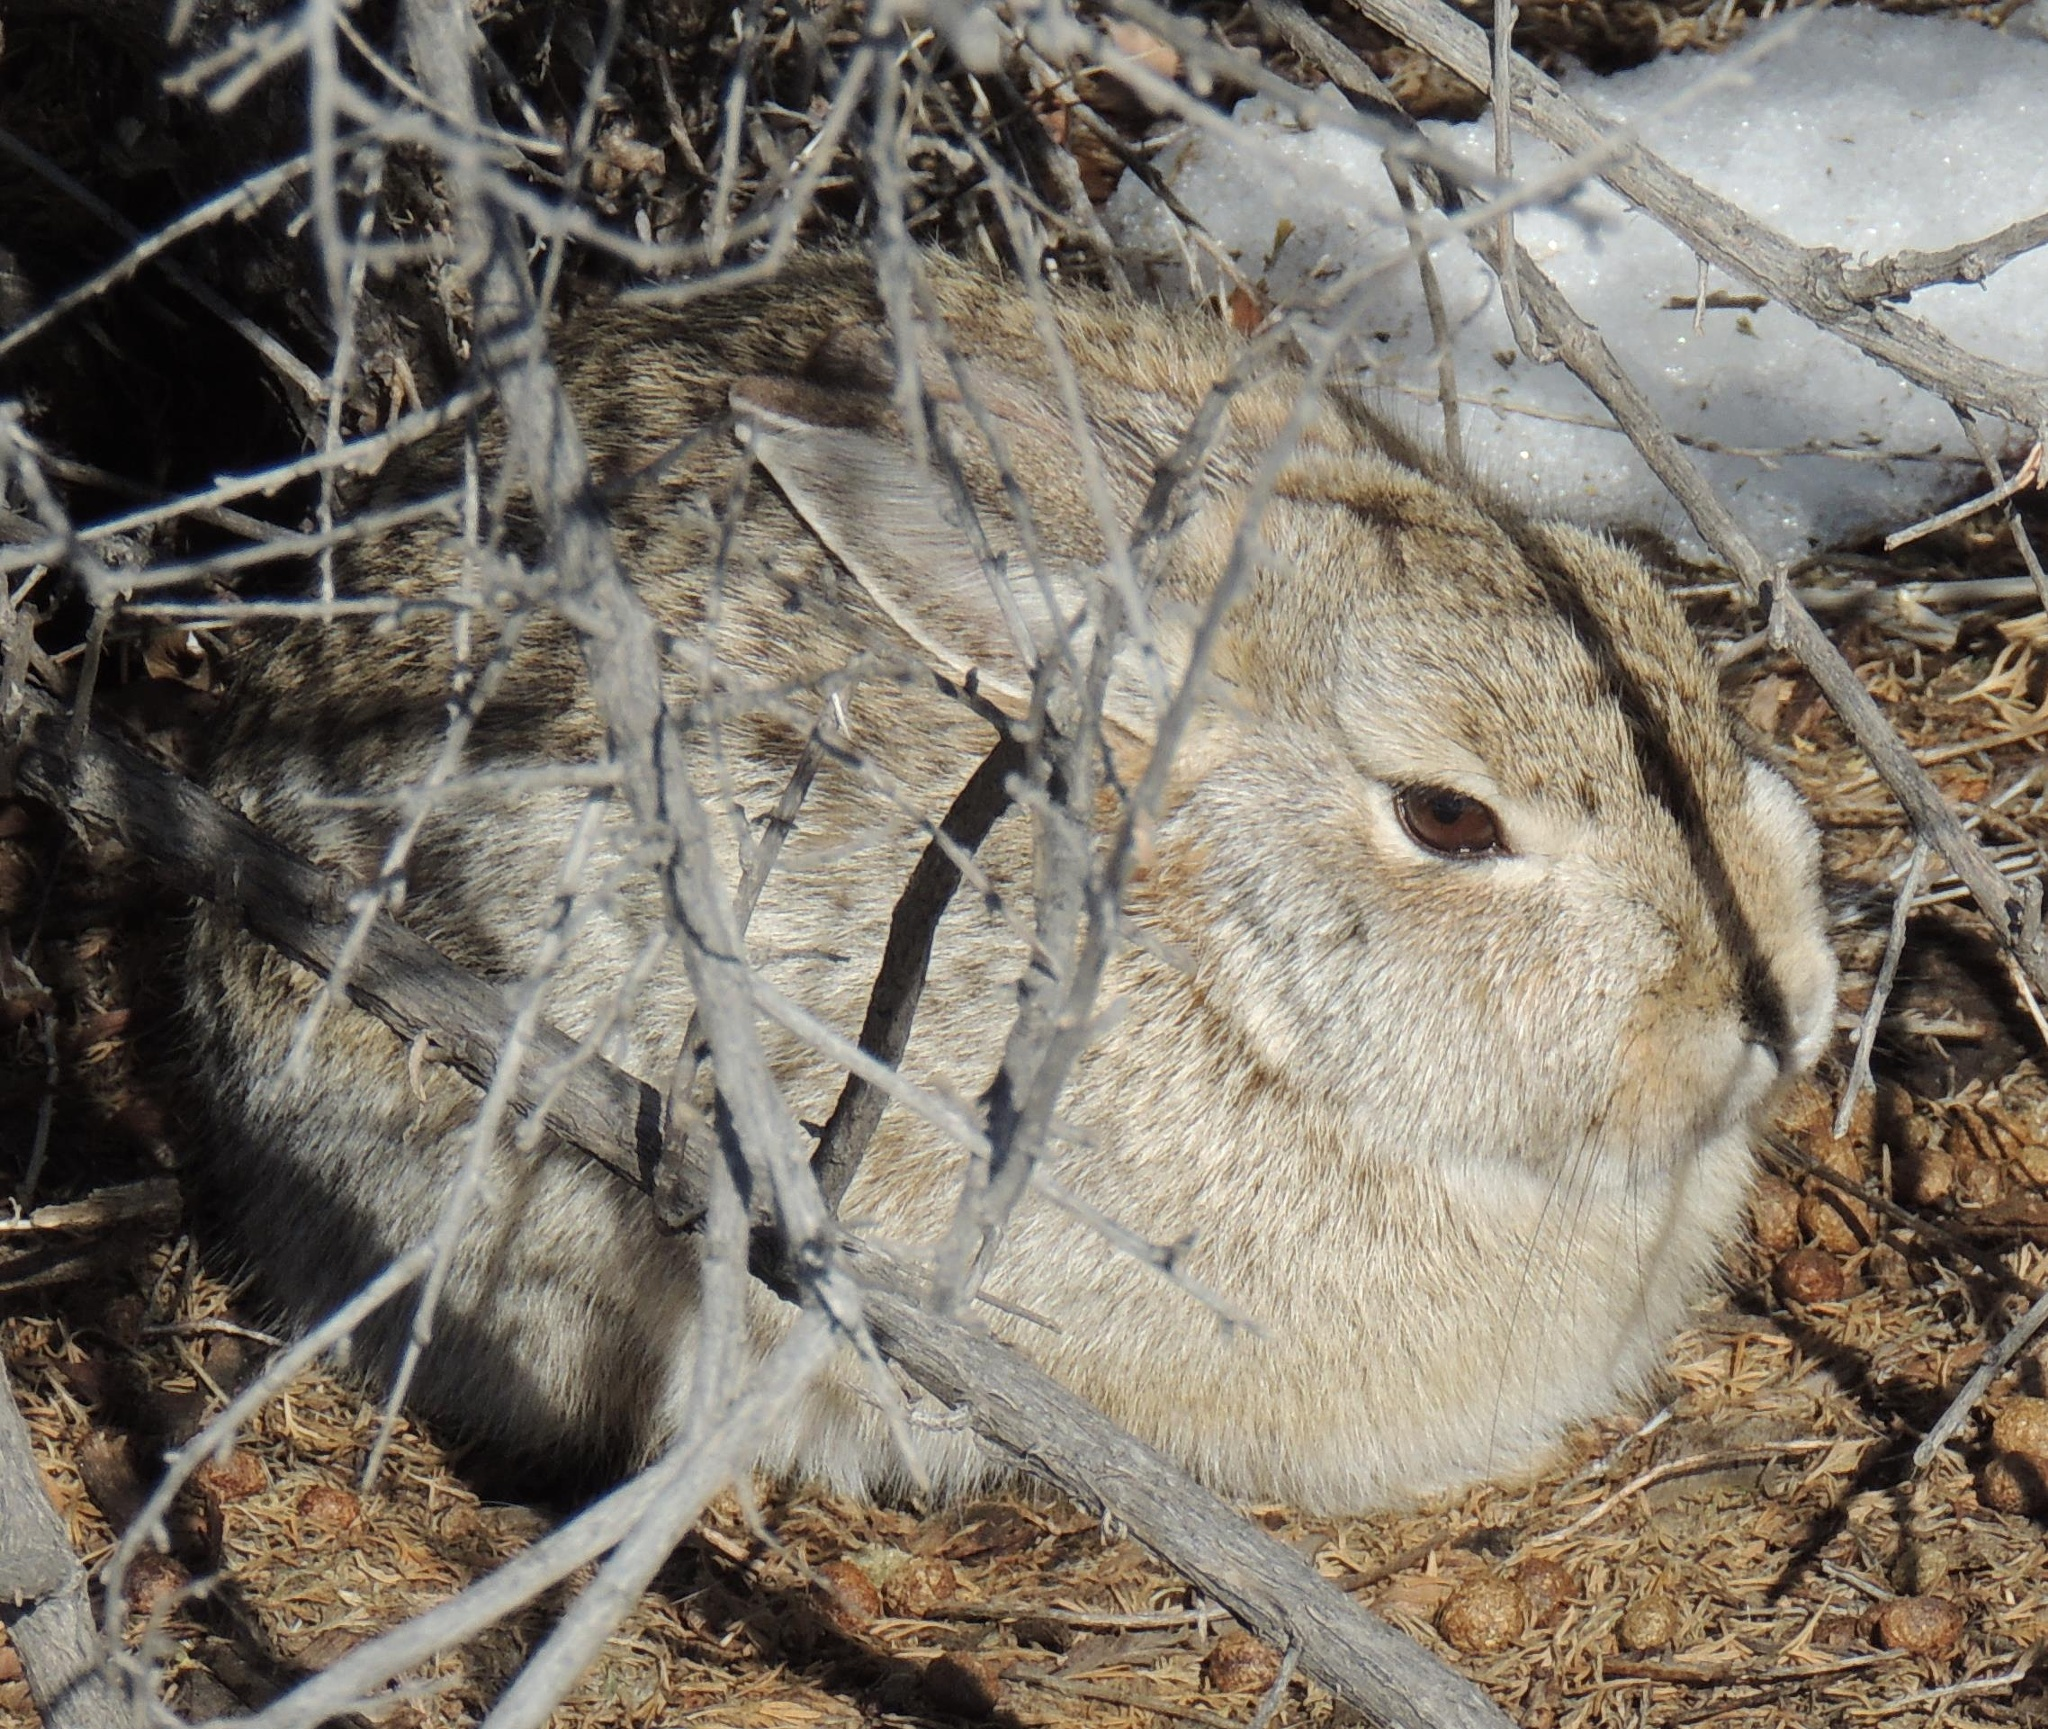 Wyoming rabbit by sh2020